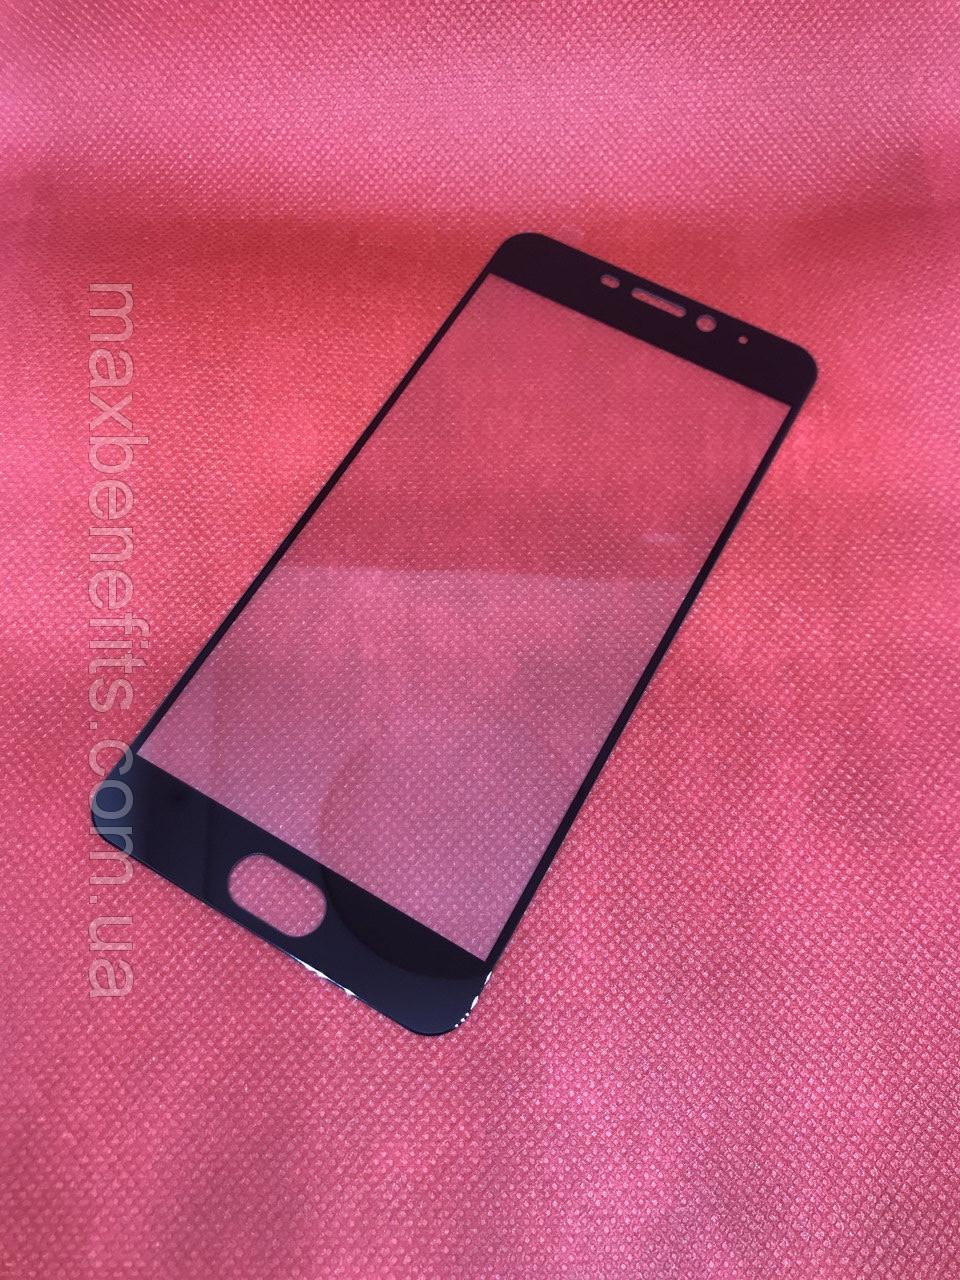 Meizu M6 защитное 2,5D 3D стекло Full Cover (черная окантовка) полное покрытие